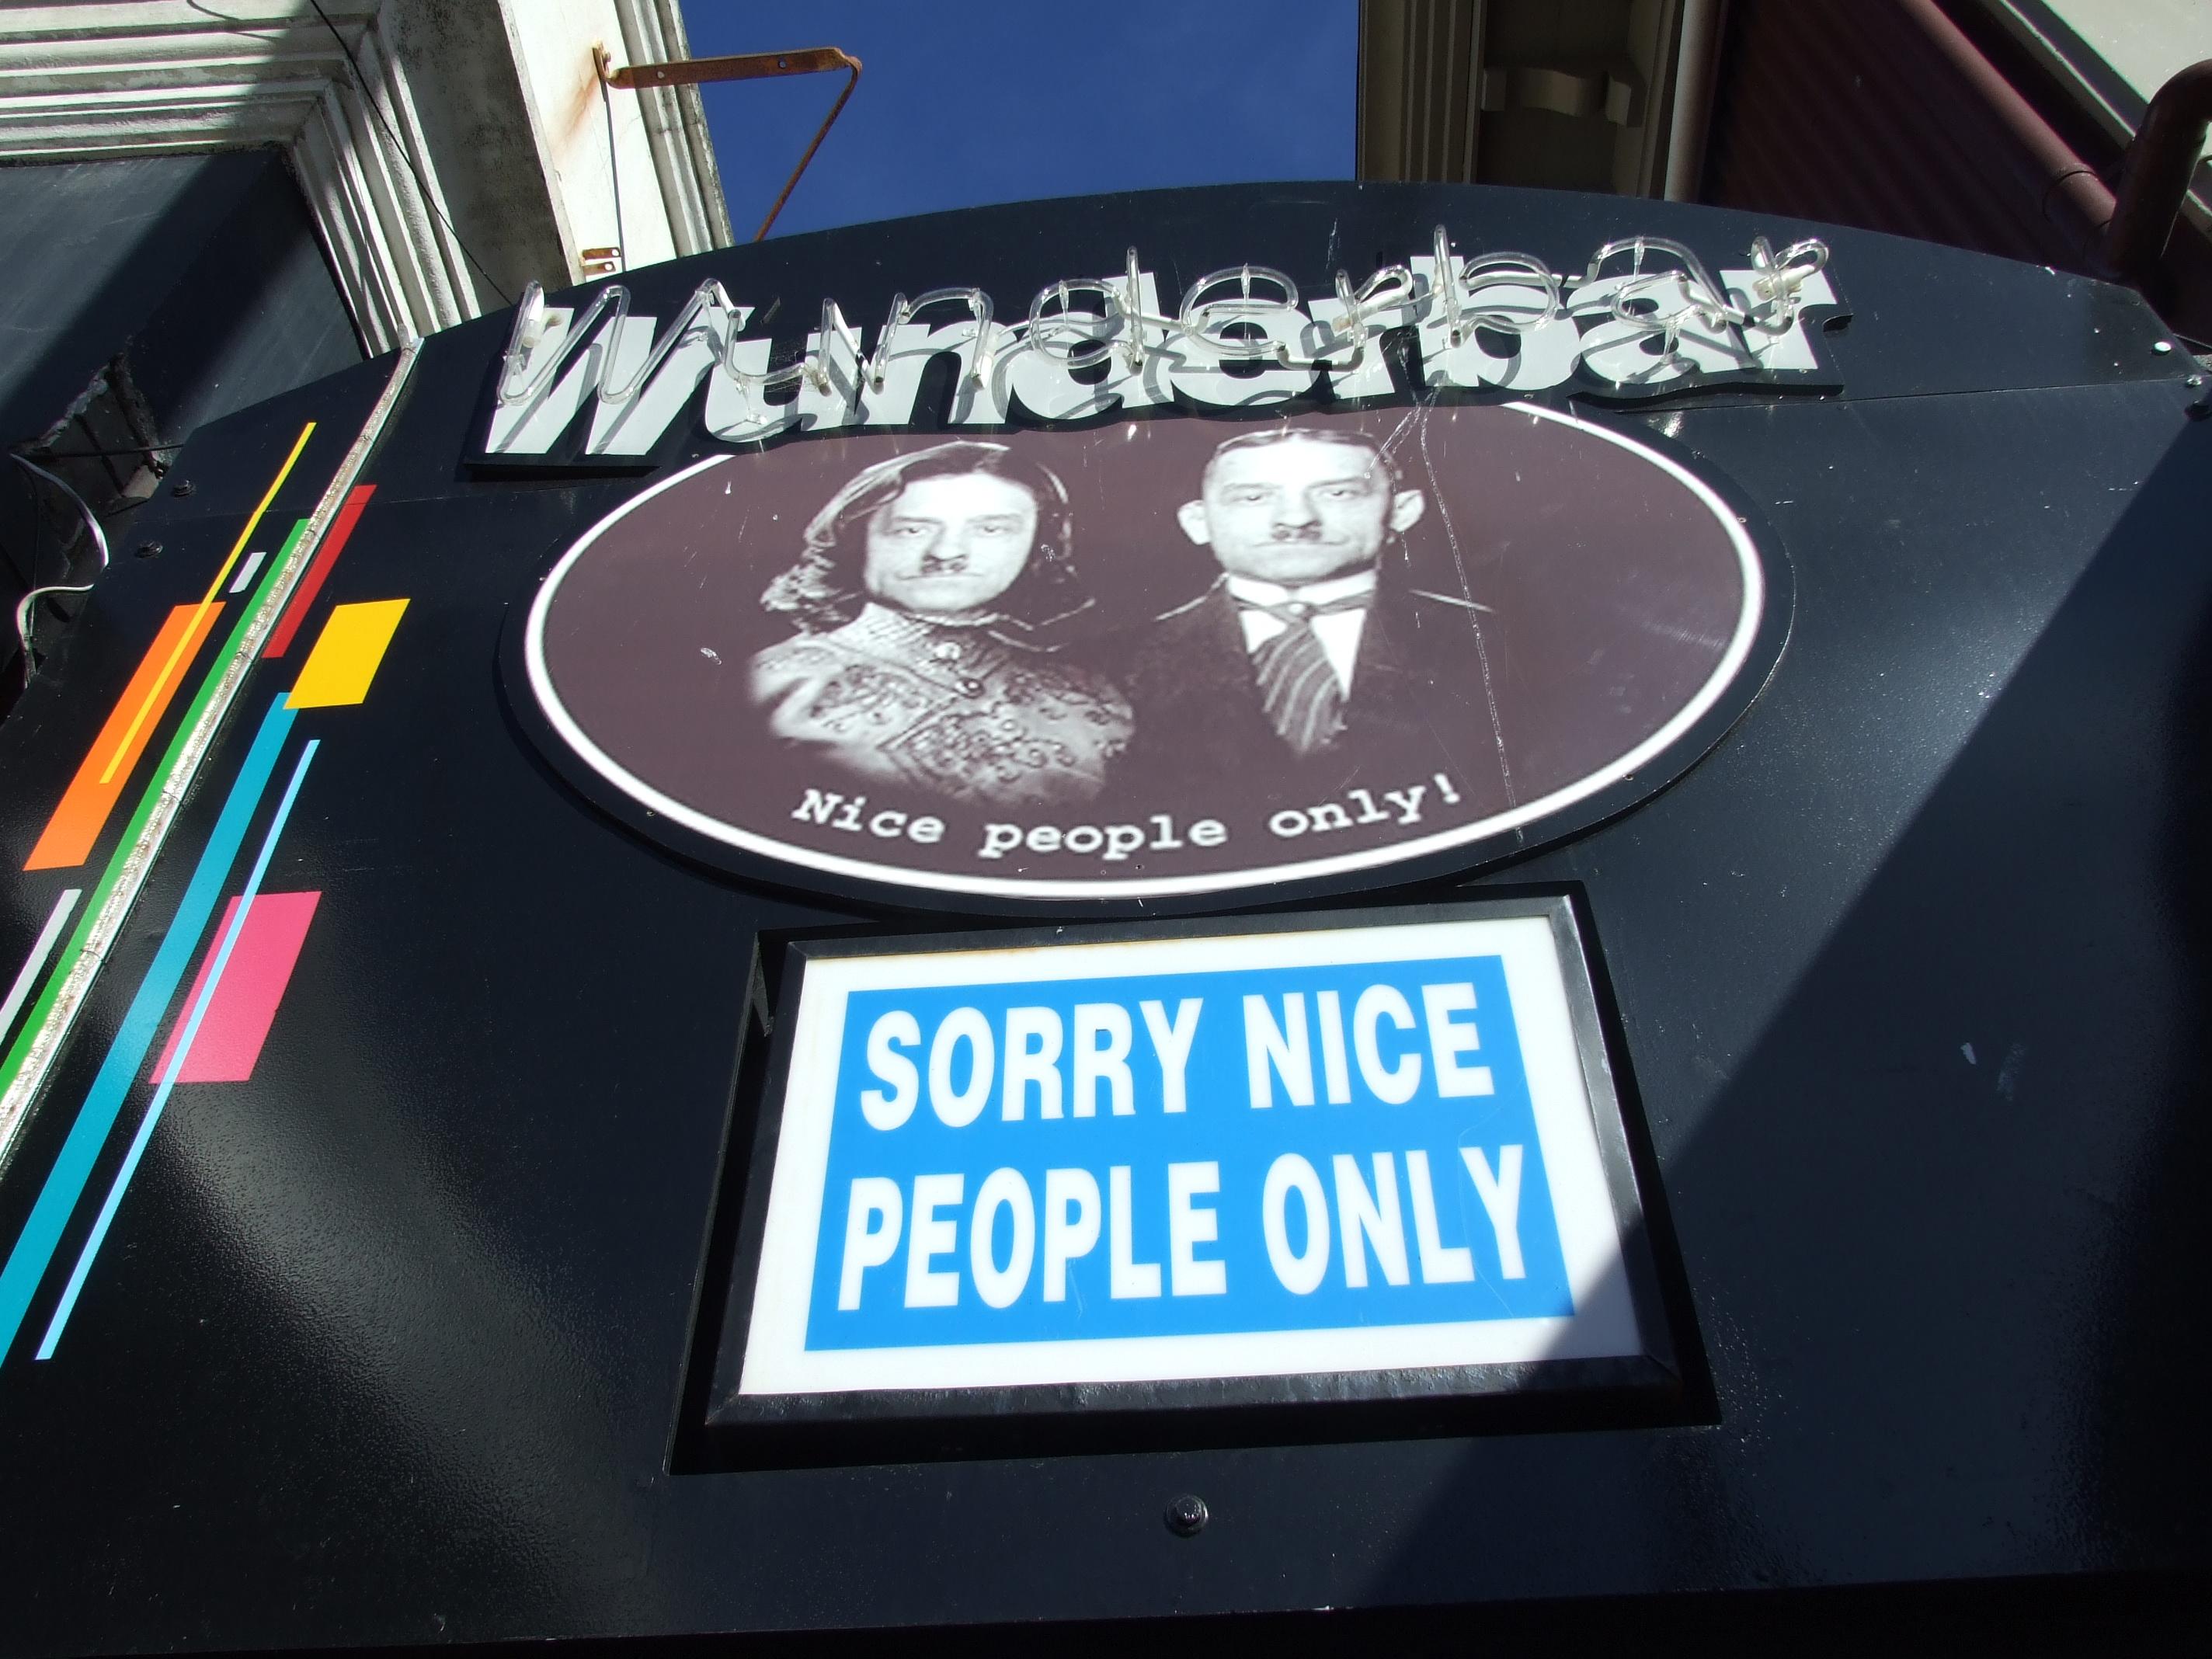 Wunderbar - Nice People Only